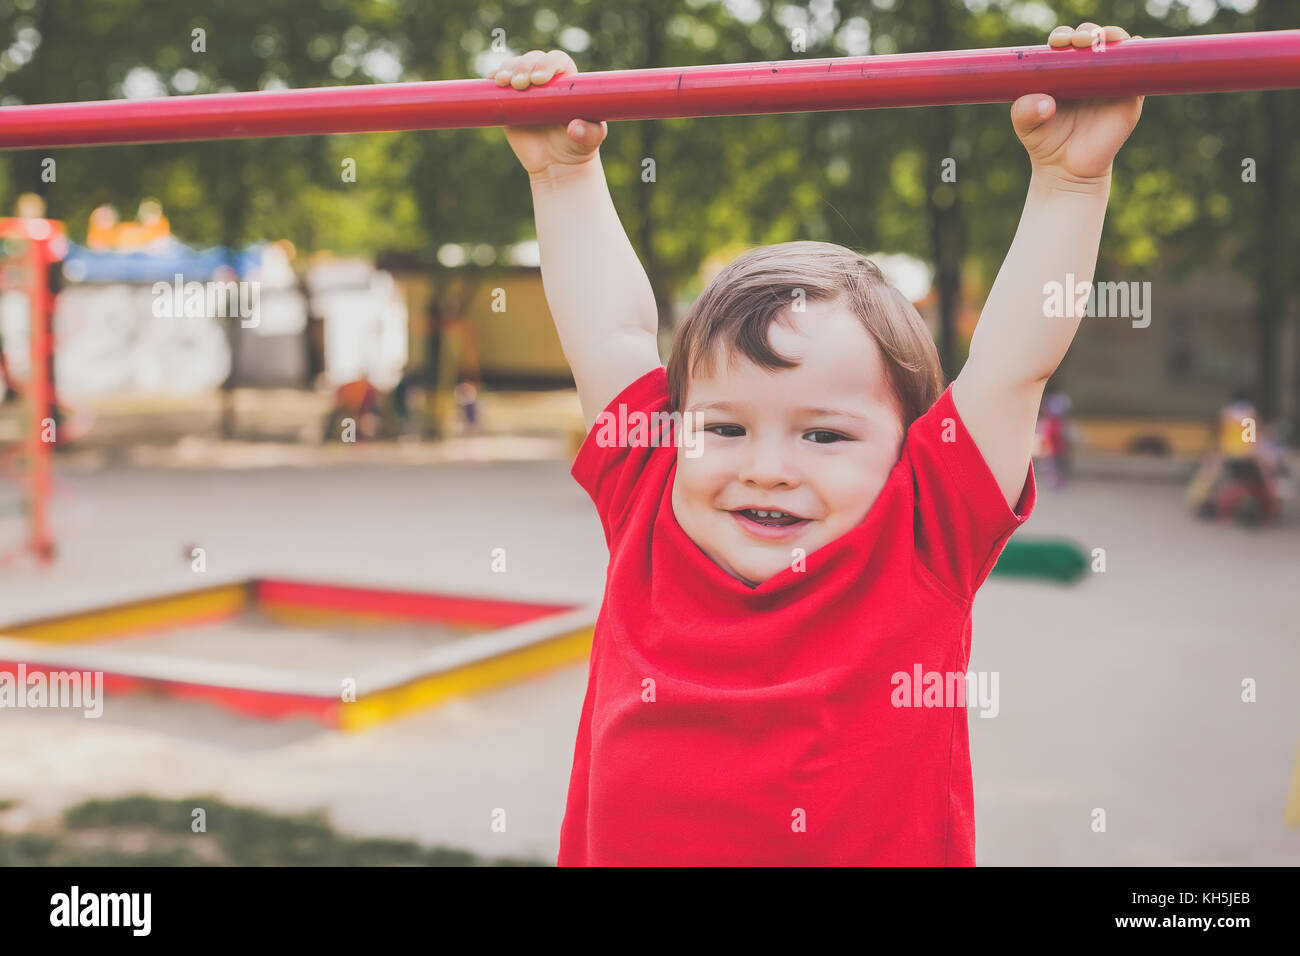 Retrato de menino bonito a sorrir e brincar no parque infantil Imagens de Stock